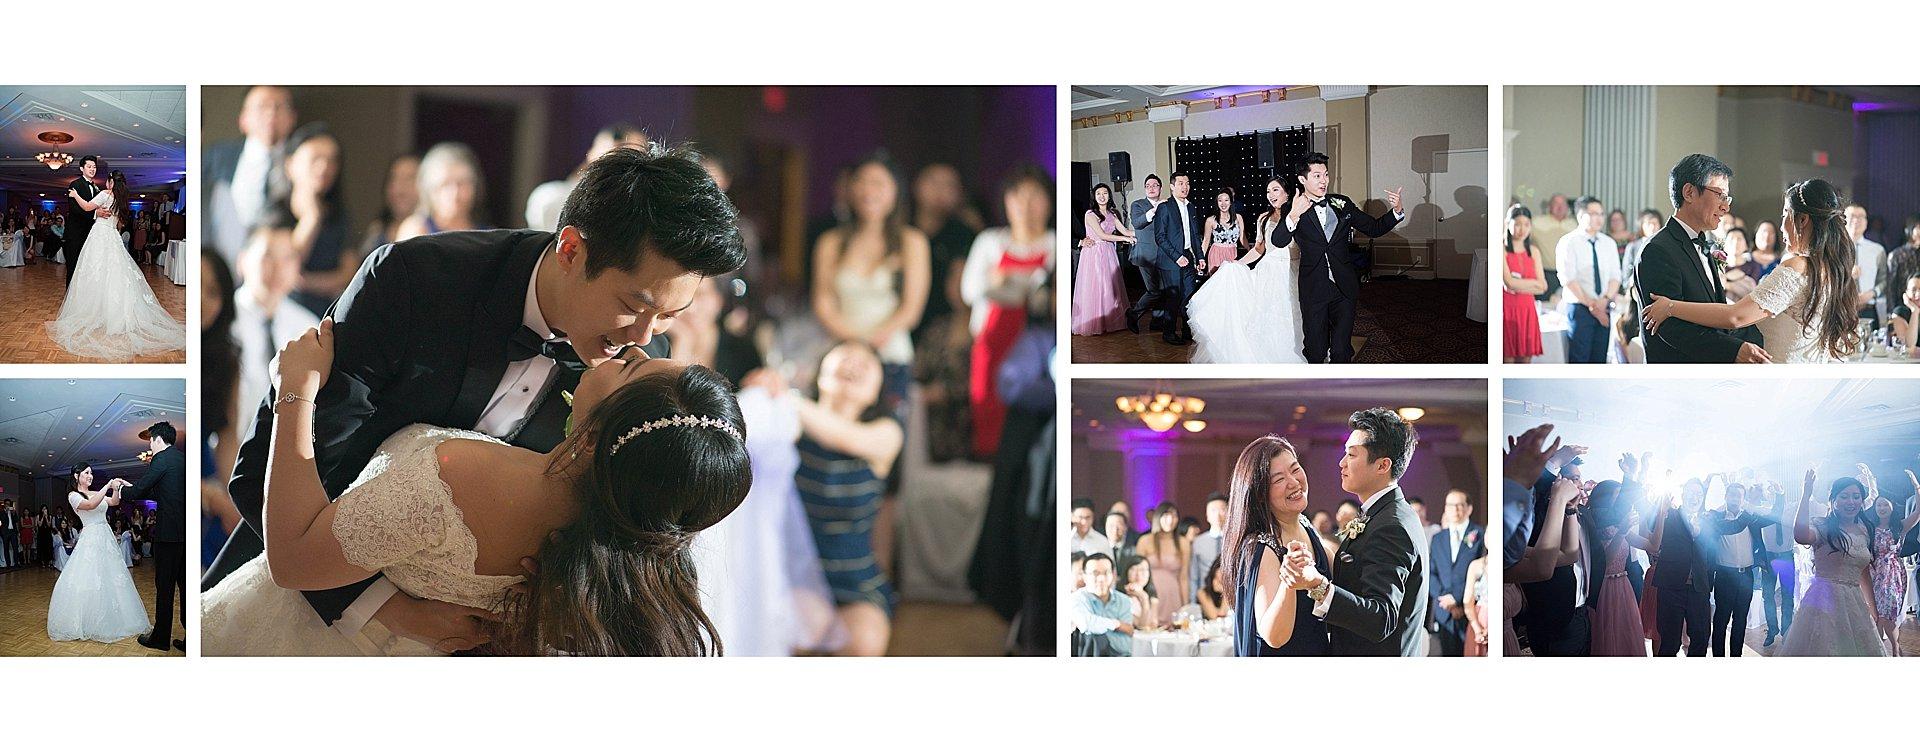 MB-First-Baptist-Church-Edmonton-Wedding-_0009